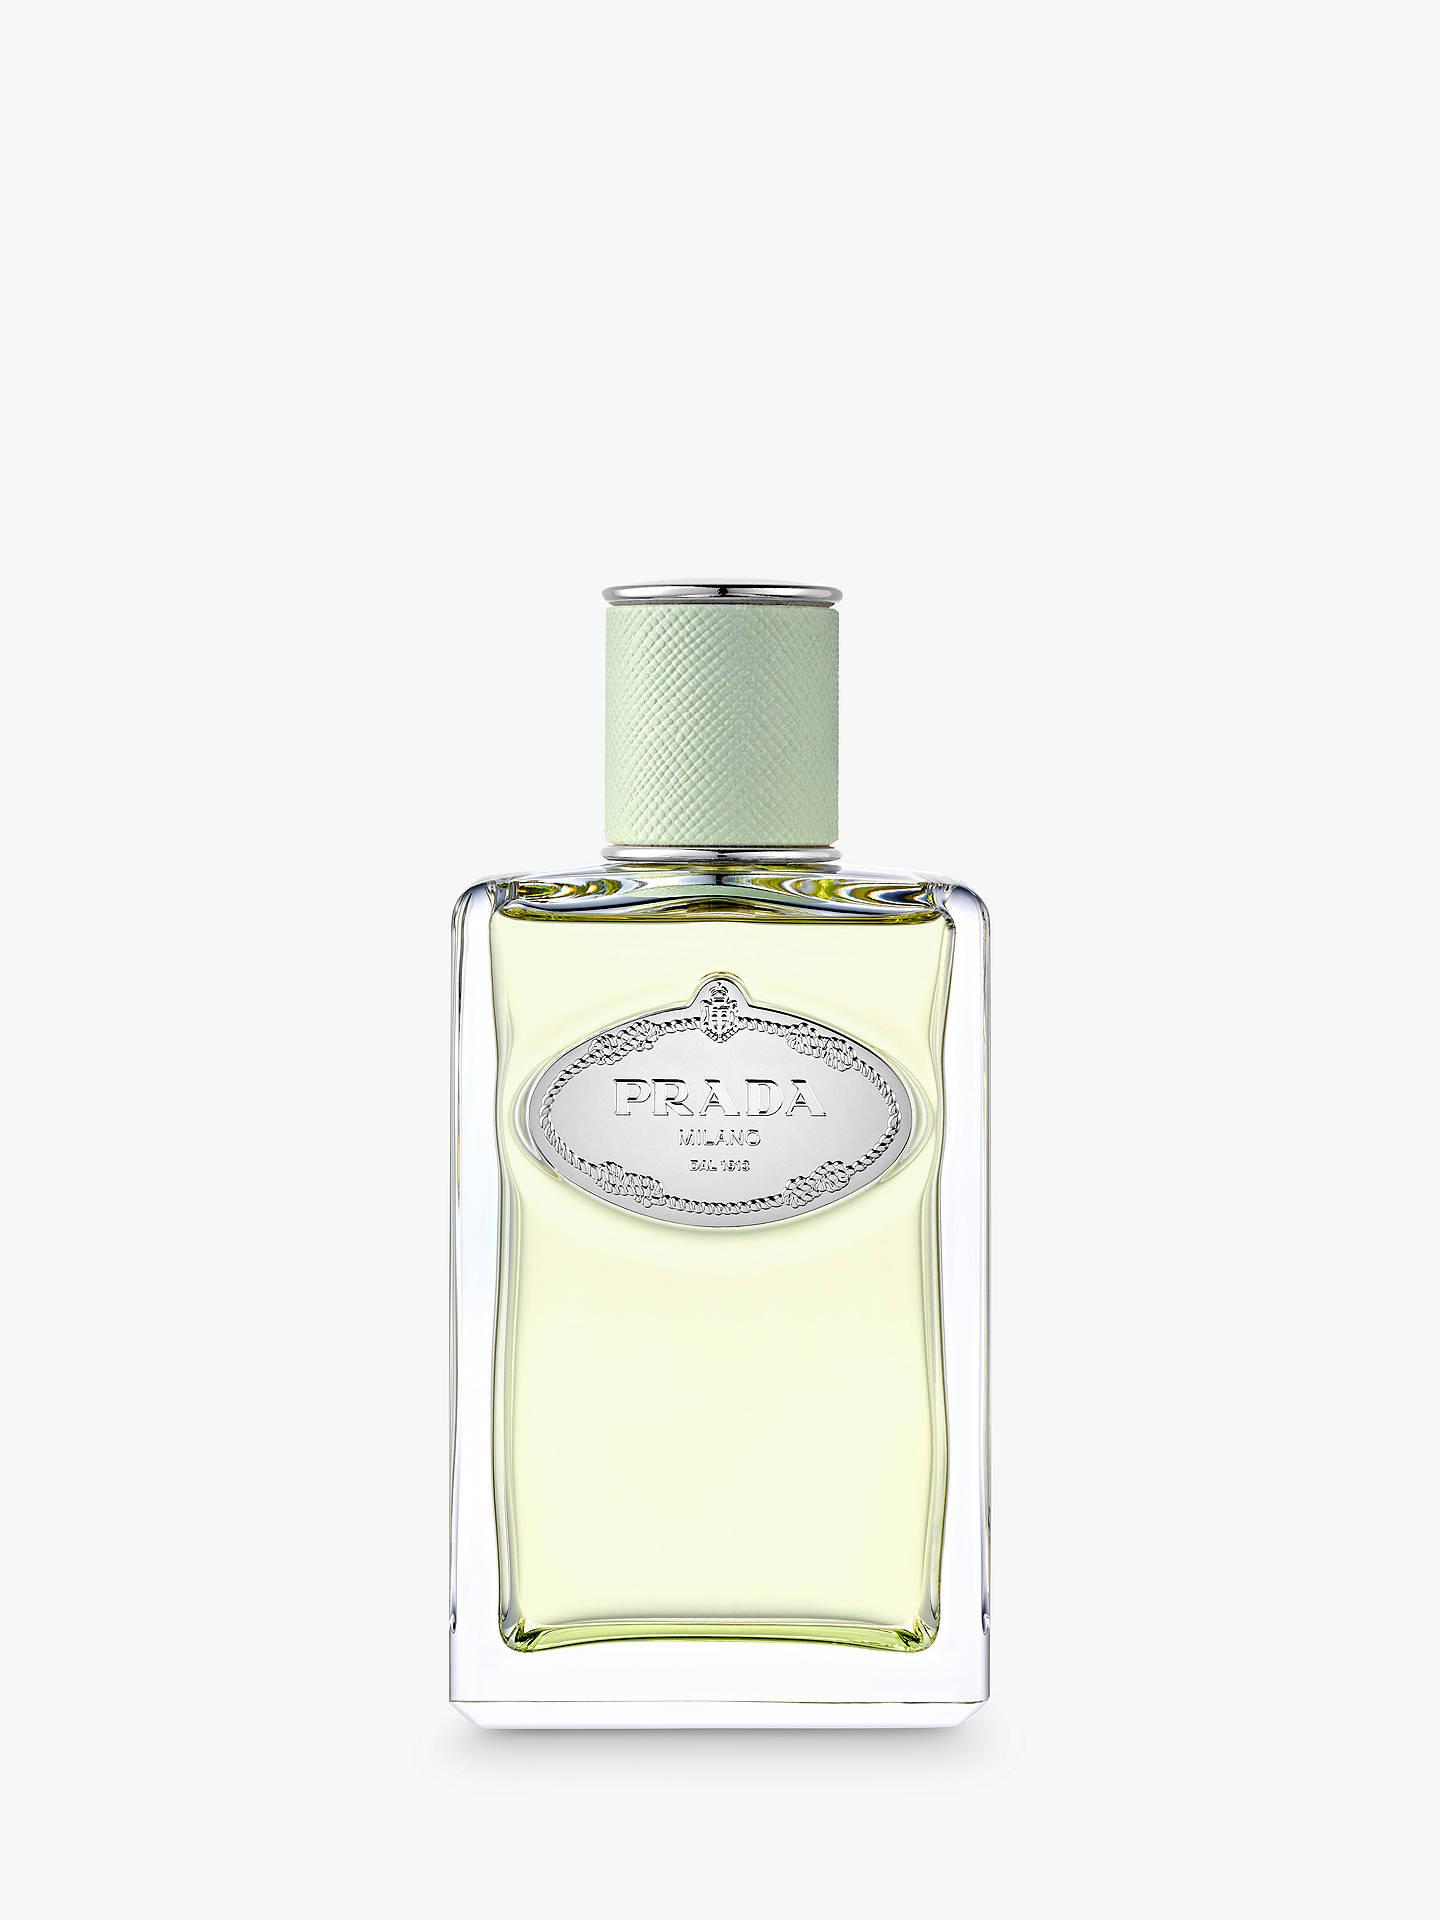 8f4be6b5 Prada Les Infusions de Prada Iris Eau de Parfum at John Lewis & Partners